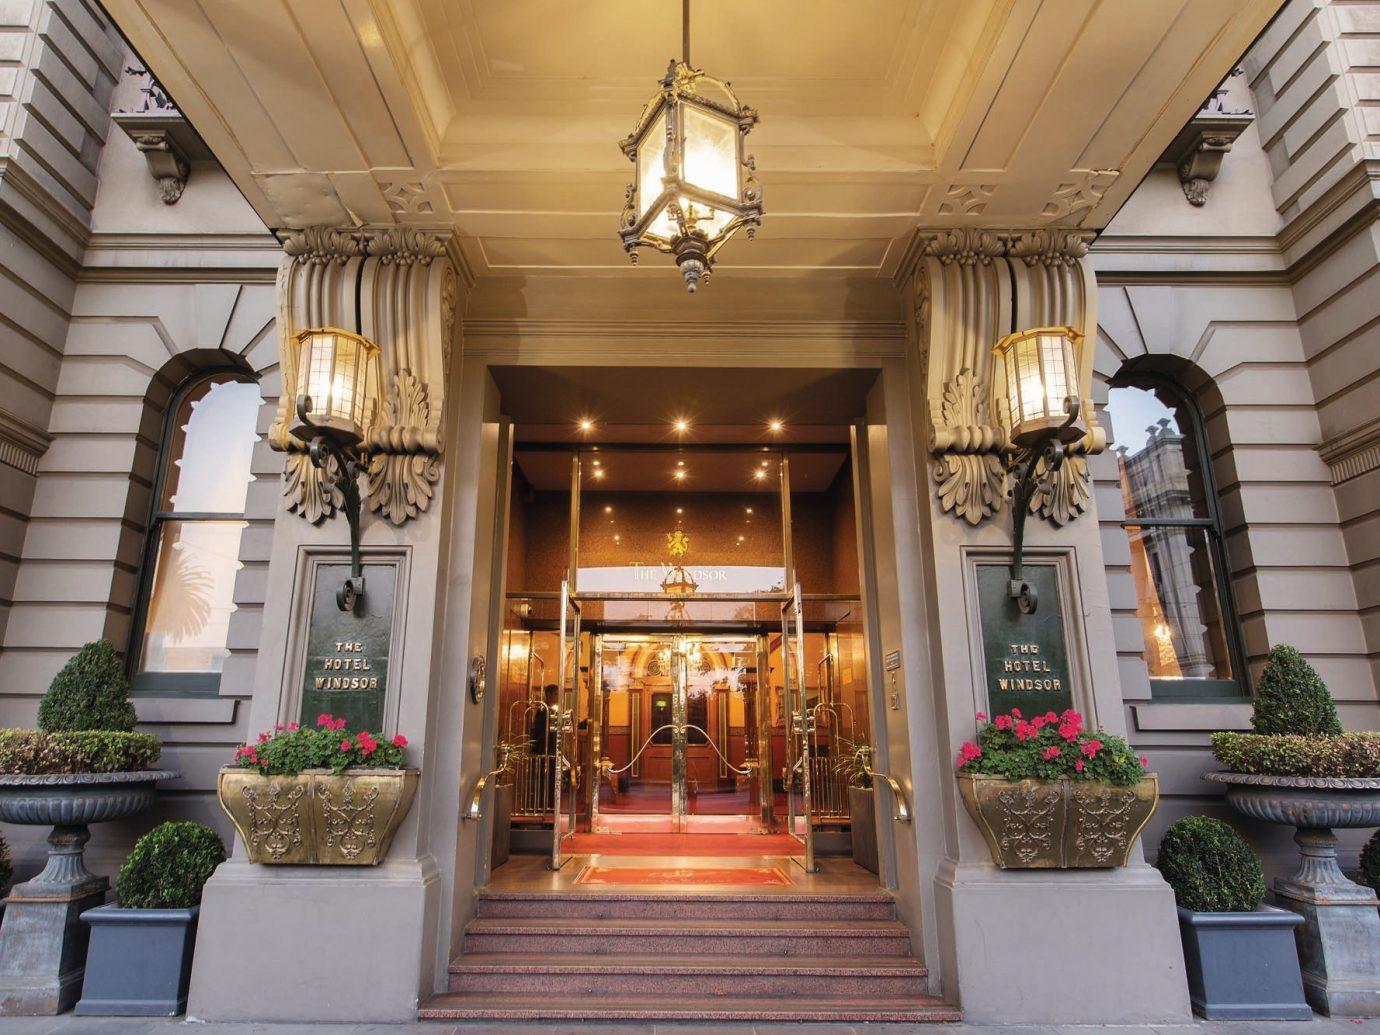 Australia Hotels Melbourne estate interior design column plant Lobby home real estate facade window stone decorated